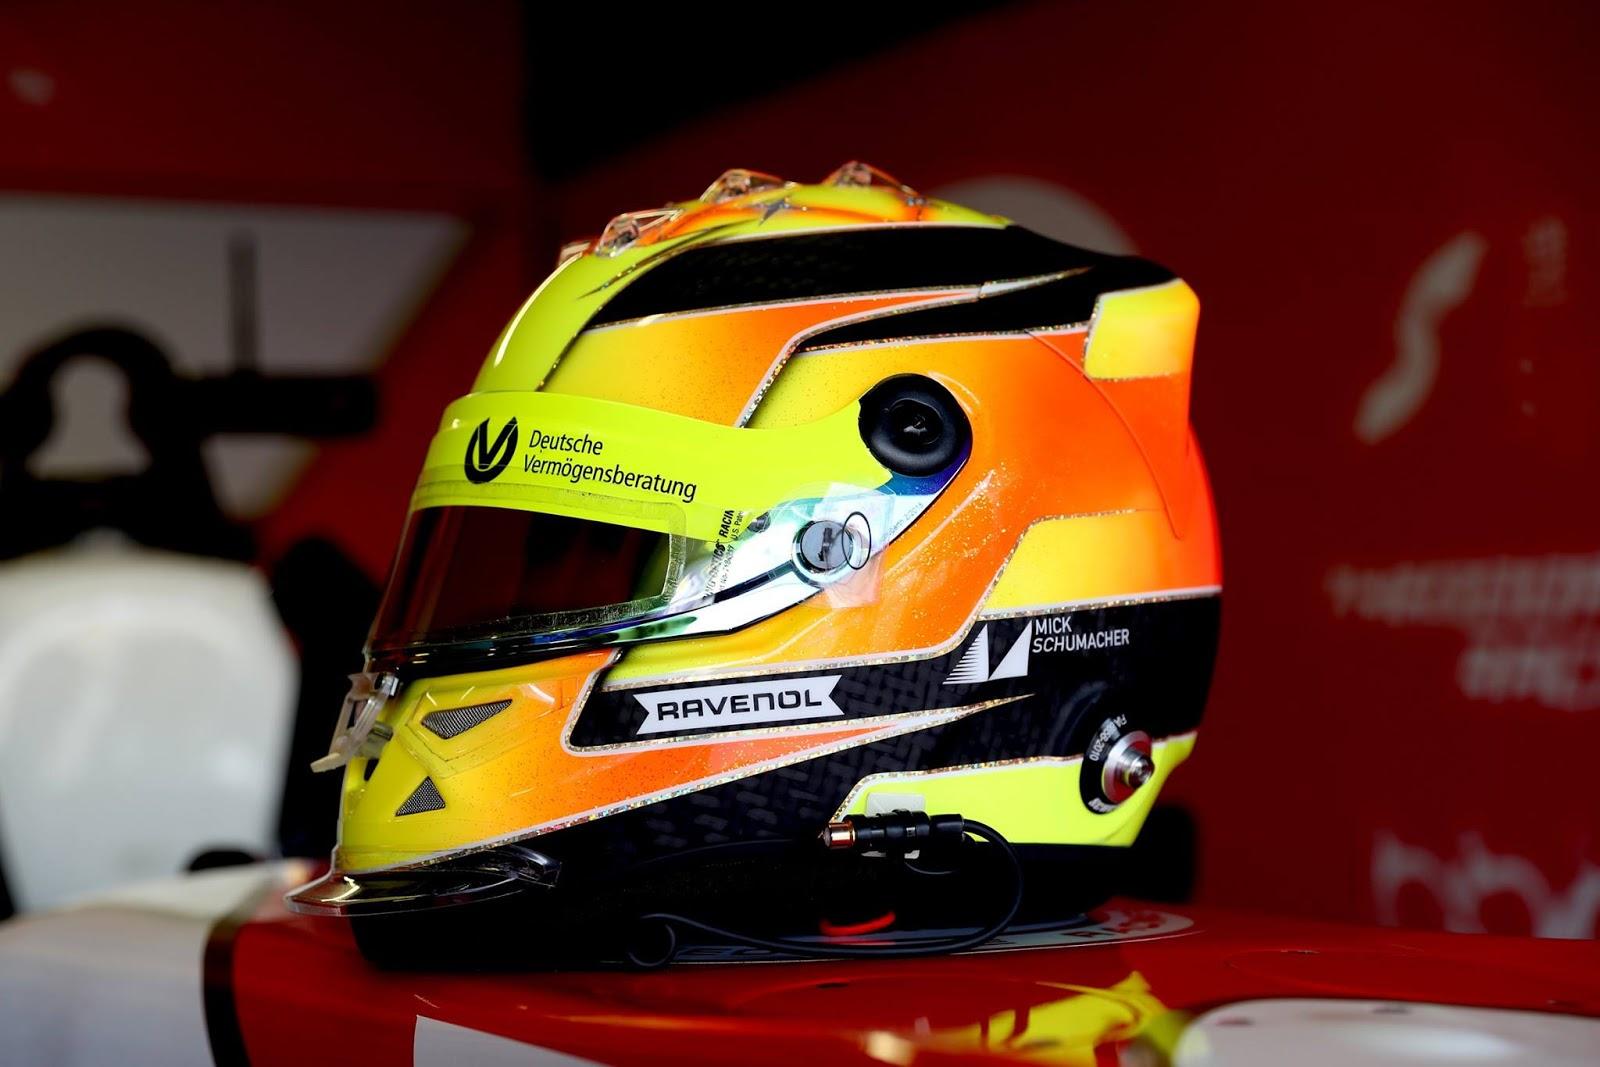 Auto Racing Helmets >> Racing Helmets Garage: Schuberth SF1 Mick Schumacher Macau 2017 by Jens Munser Designs